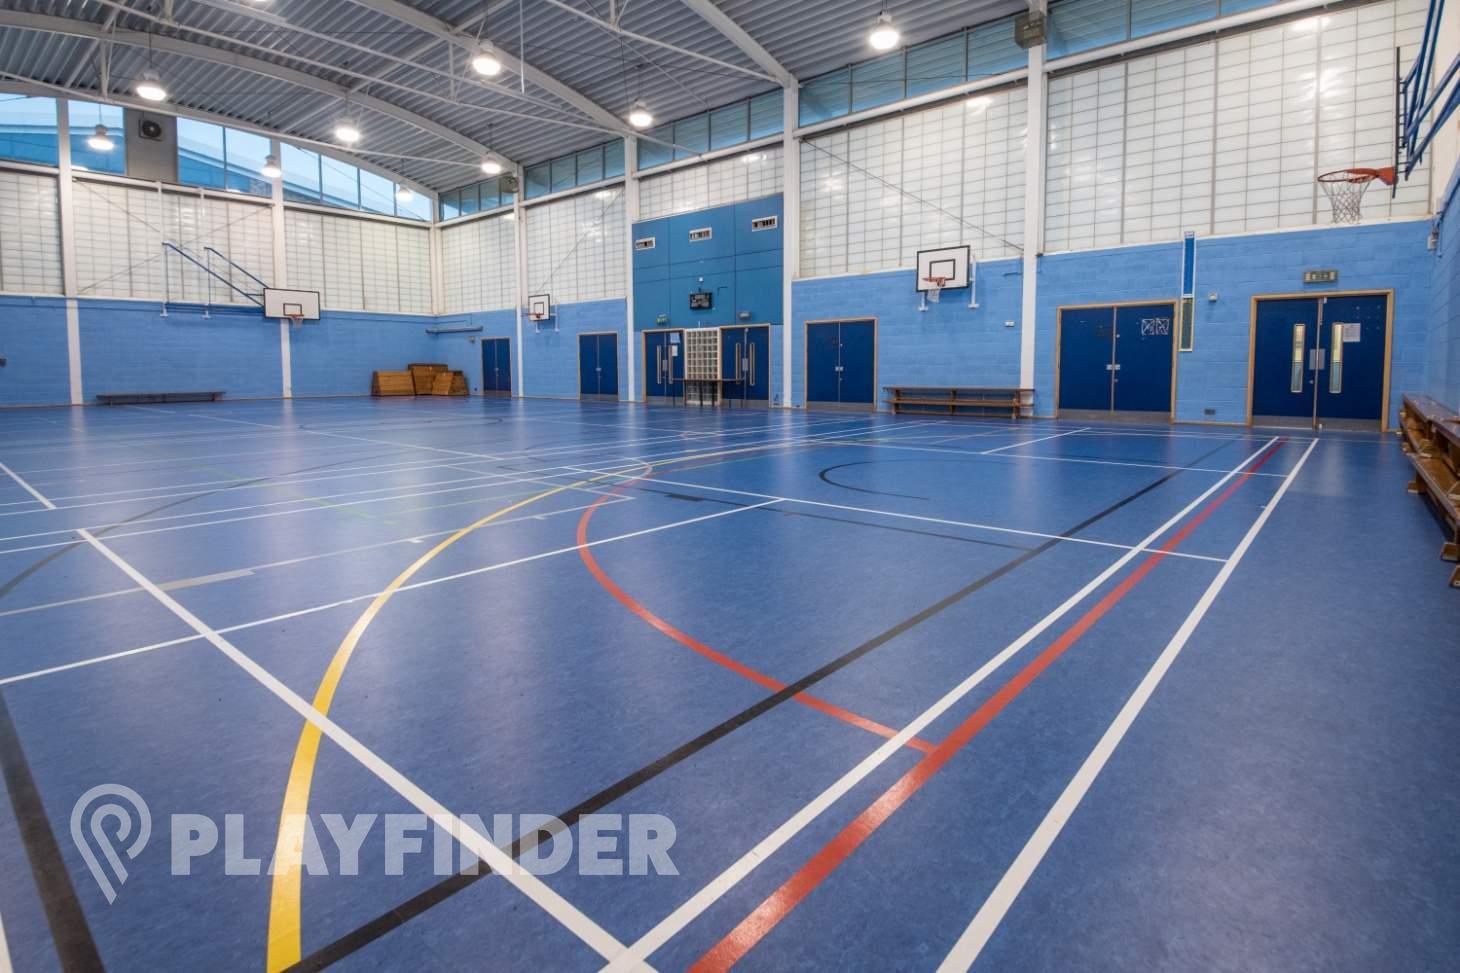 Ark Burlington Danes Academy Court   Sports hall volleyball court